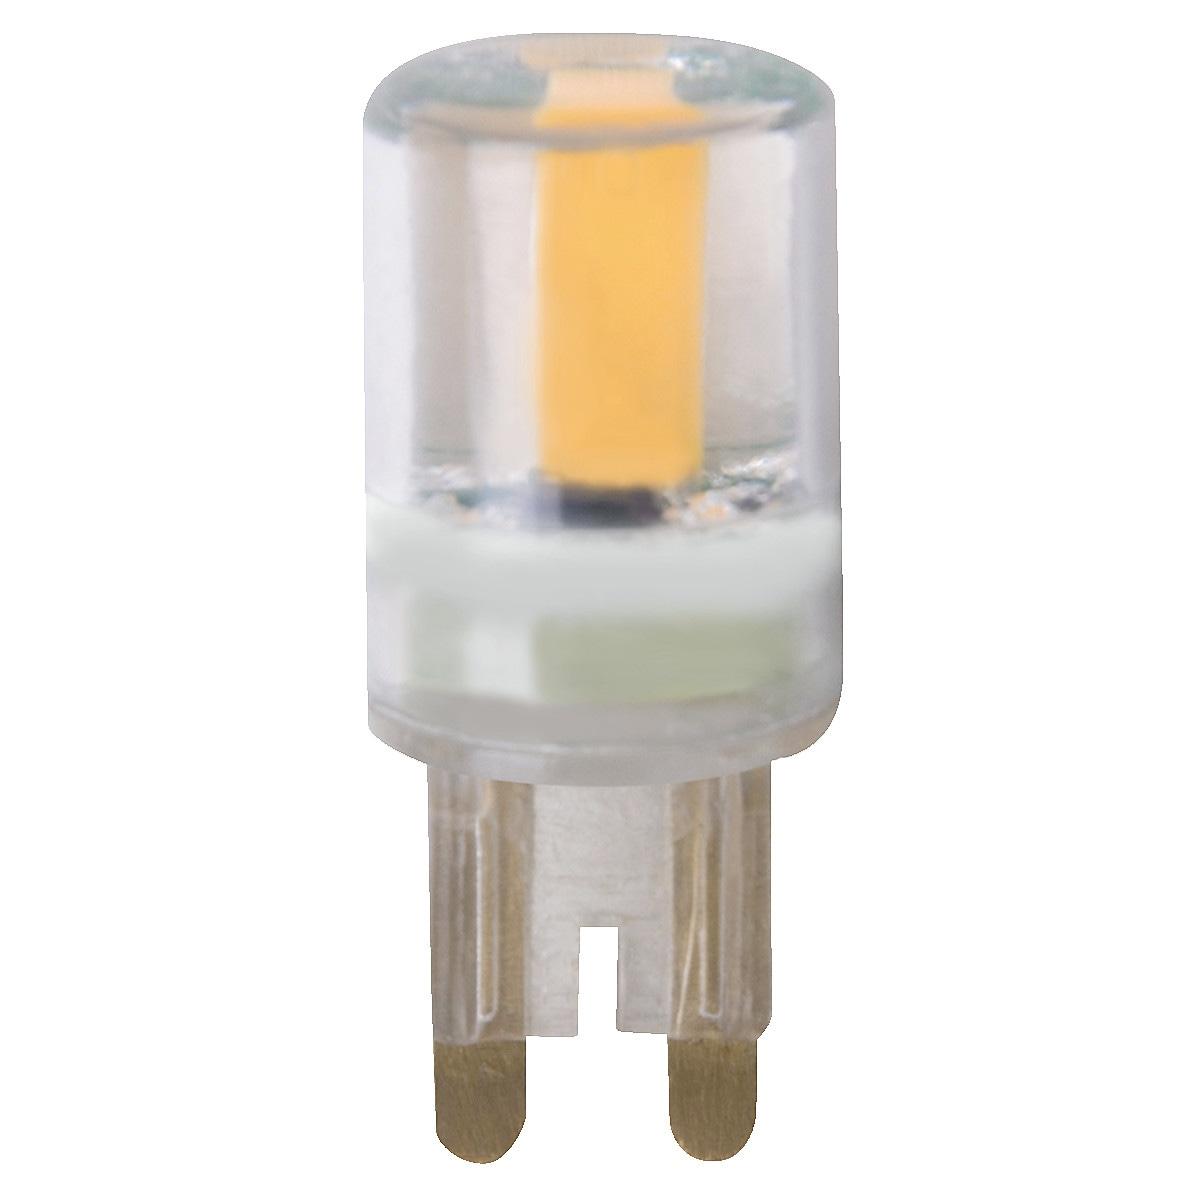 Northlight LED-pære GU9